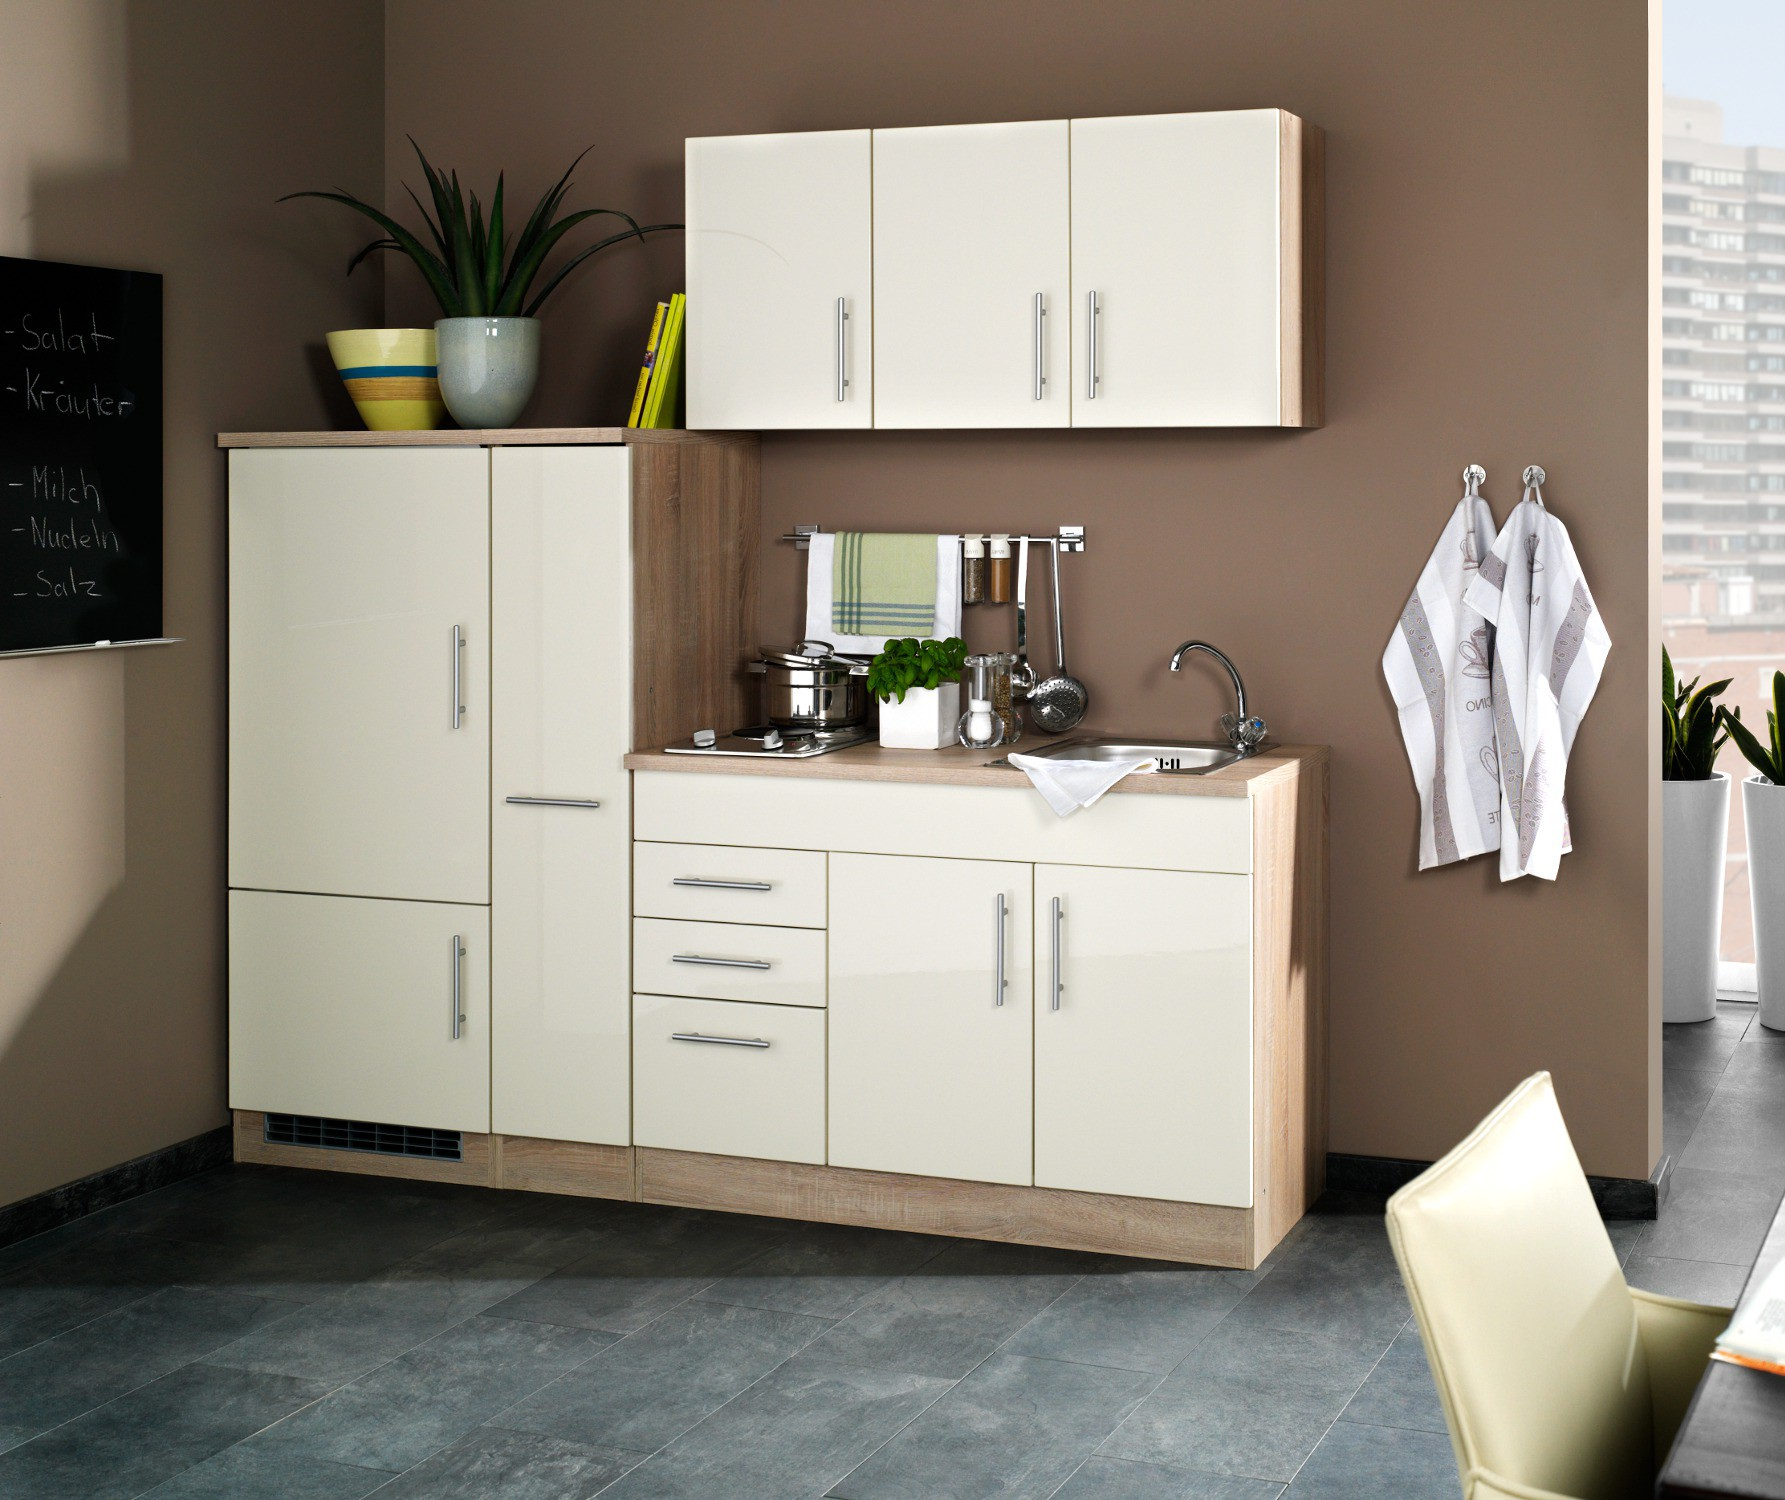 singlek che berlin breite 210 cm hochglanz creme. Black Bedroom Furniture Sets. Home Design Ideas